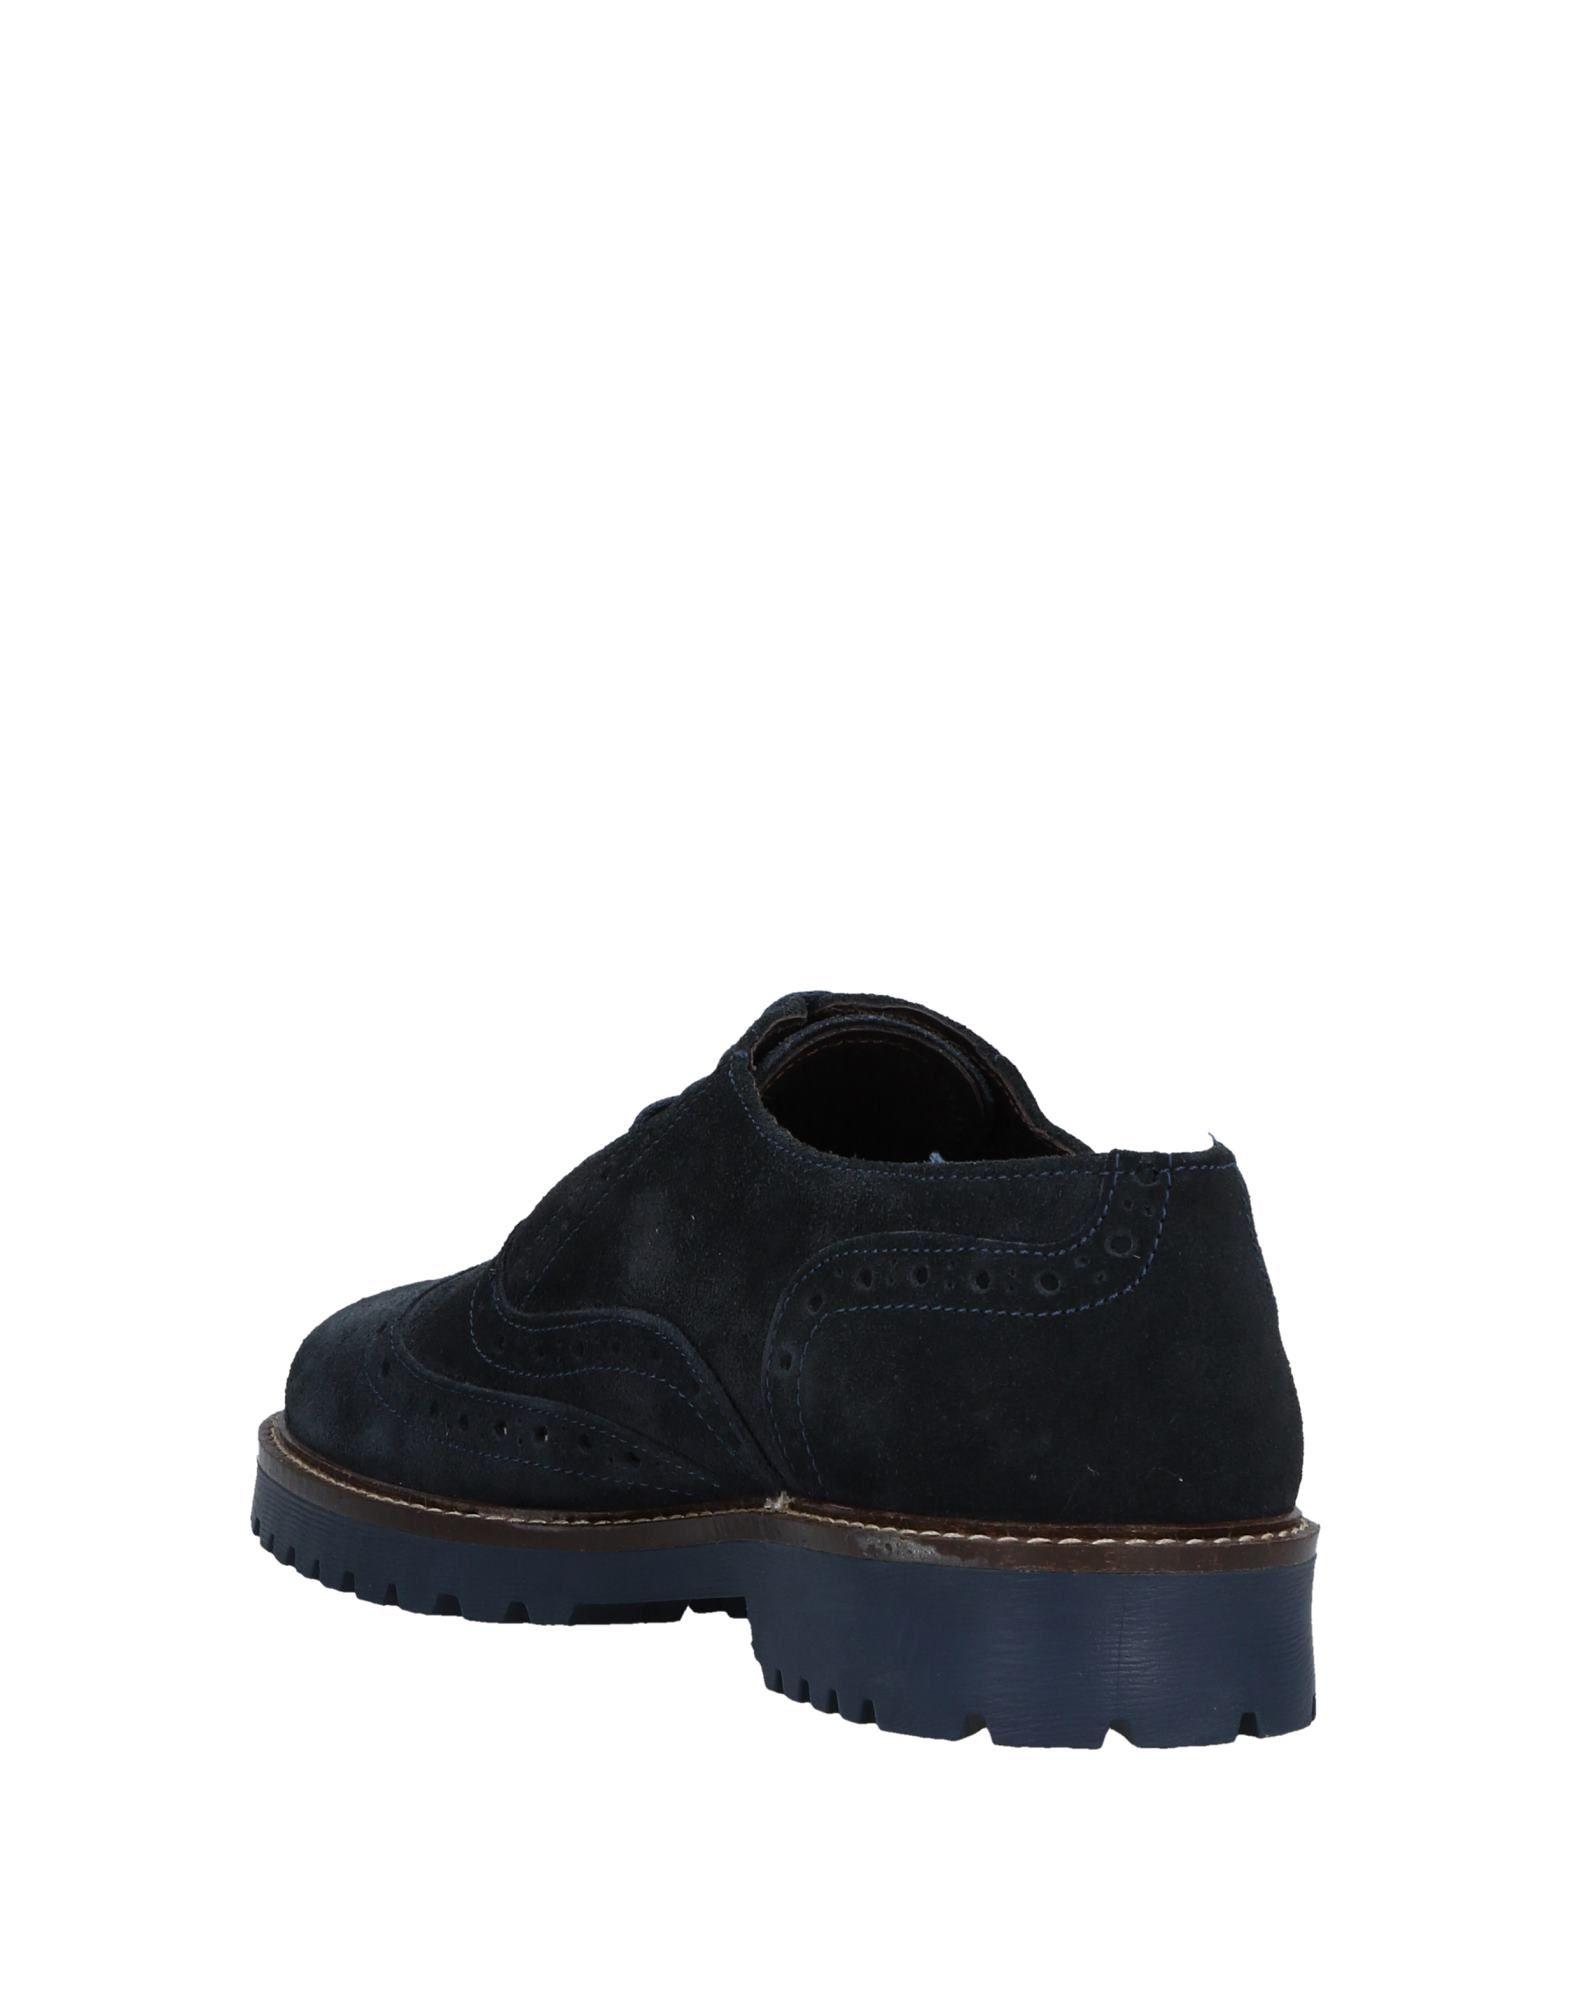 Rabatt echte Schuhe Roberto  Della Croce Schnürschuhe Herren  Roberto 11533455LS 847325